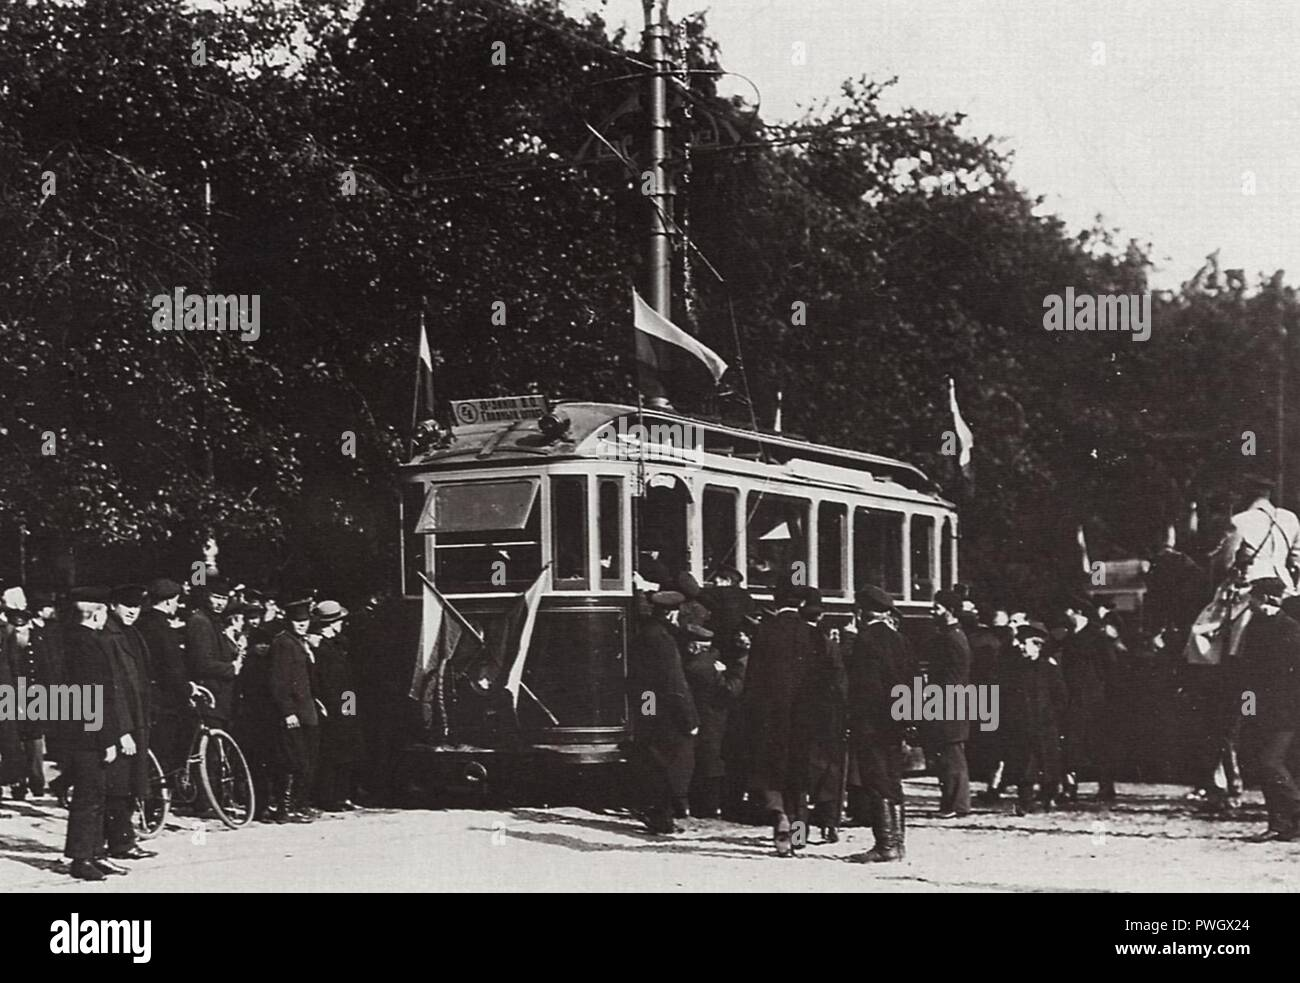 Bulla, Karl Karlovič - Feierliche Eröffnung des Straßenbahnverkehrs. St. Petersburg - Stock Image